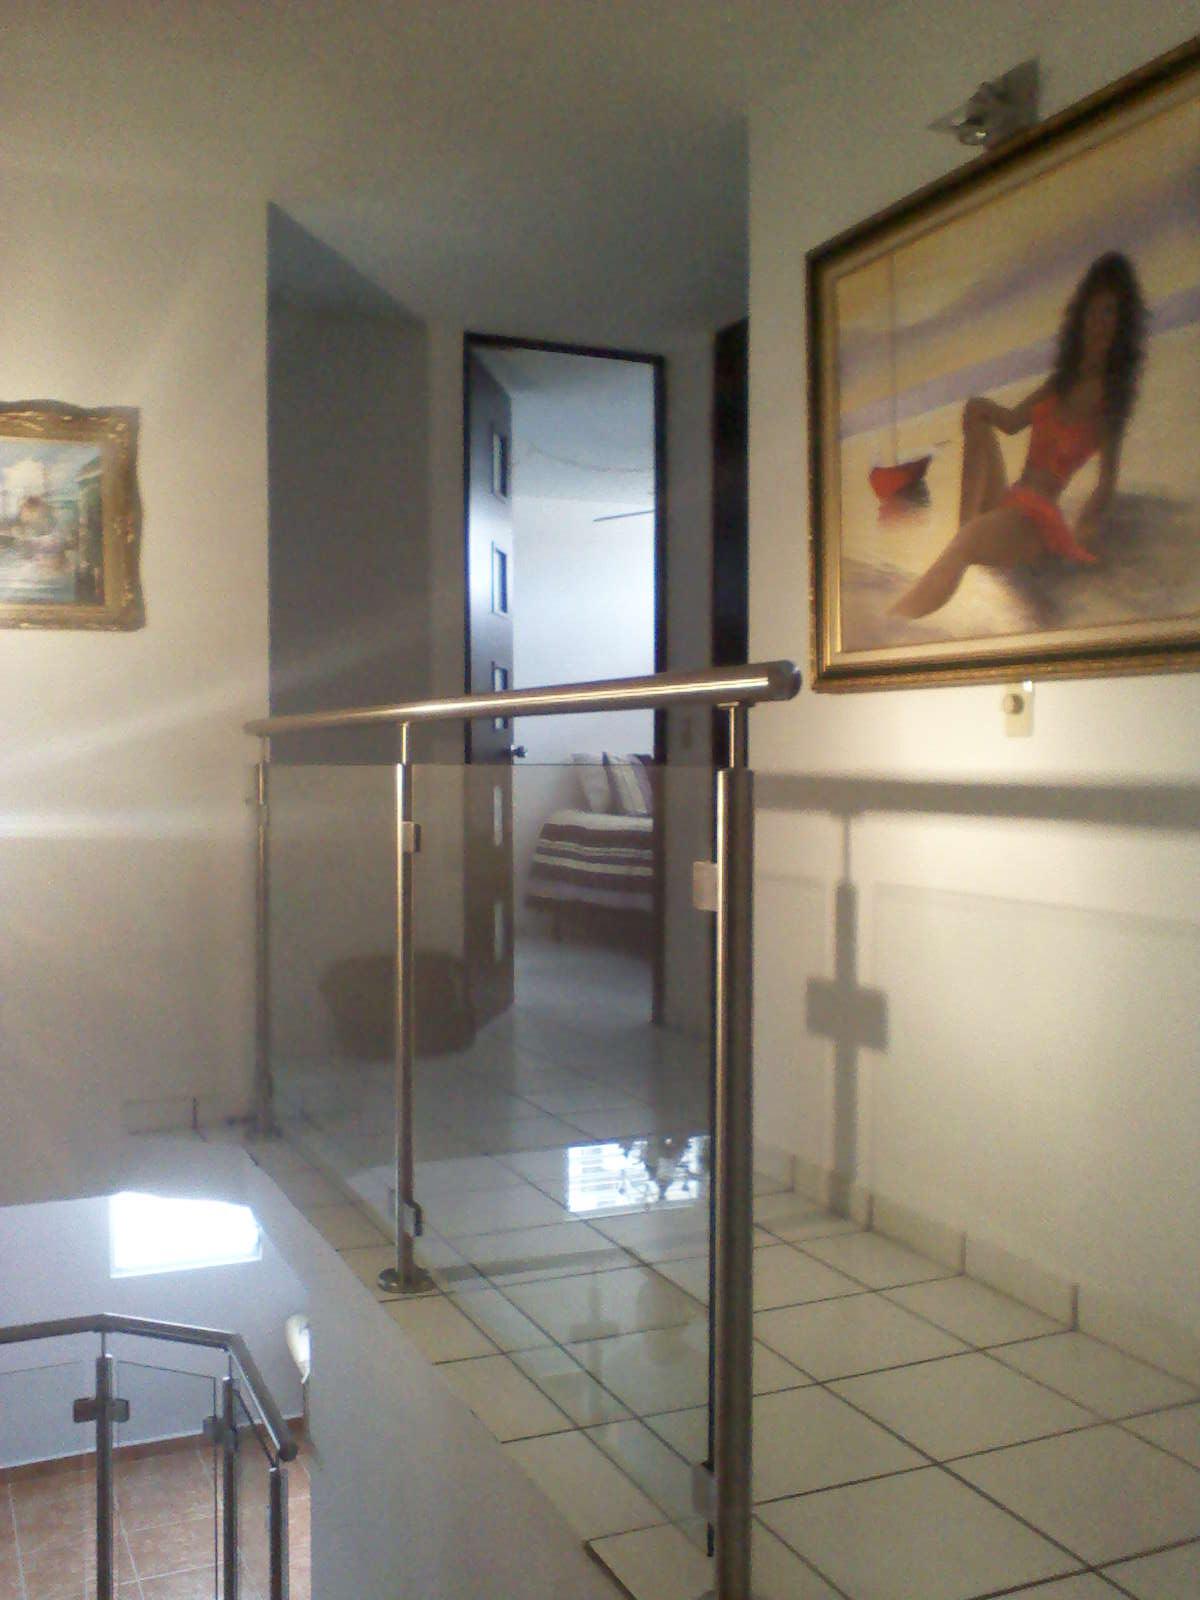 Puertas De Baño En Cristal Puerto Rico:Cristaleria Internacional: Pasamanos en Stainless Steel con Cristal